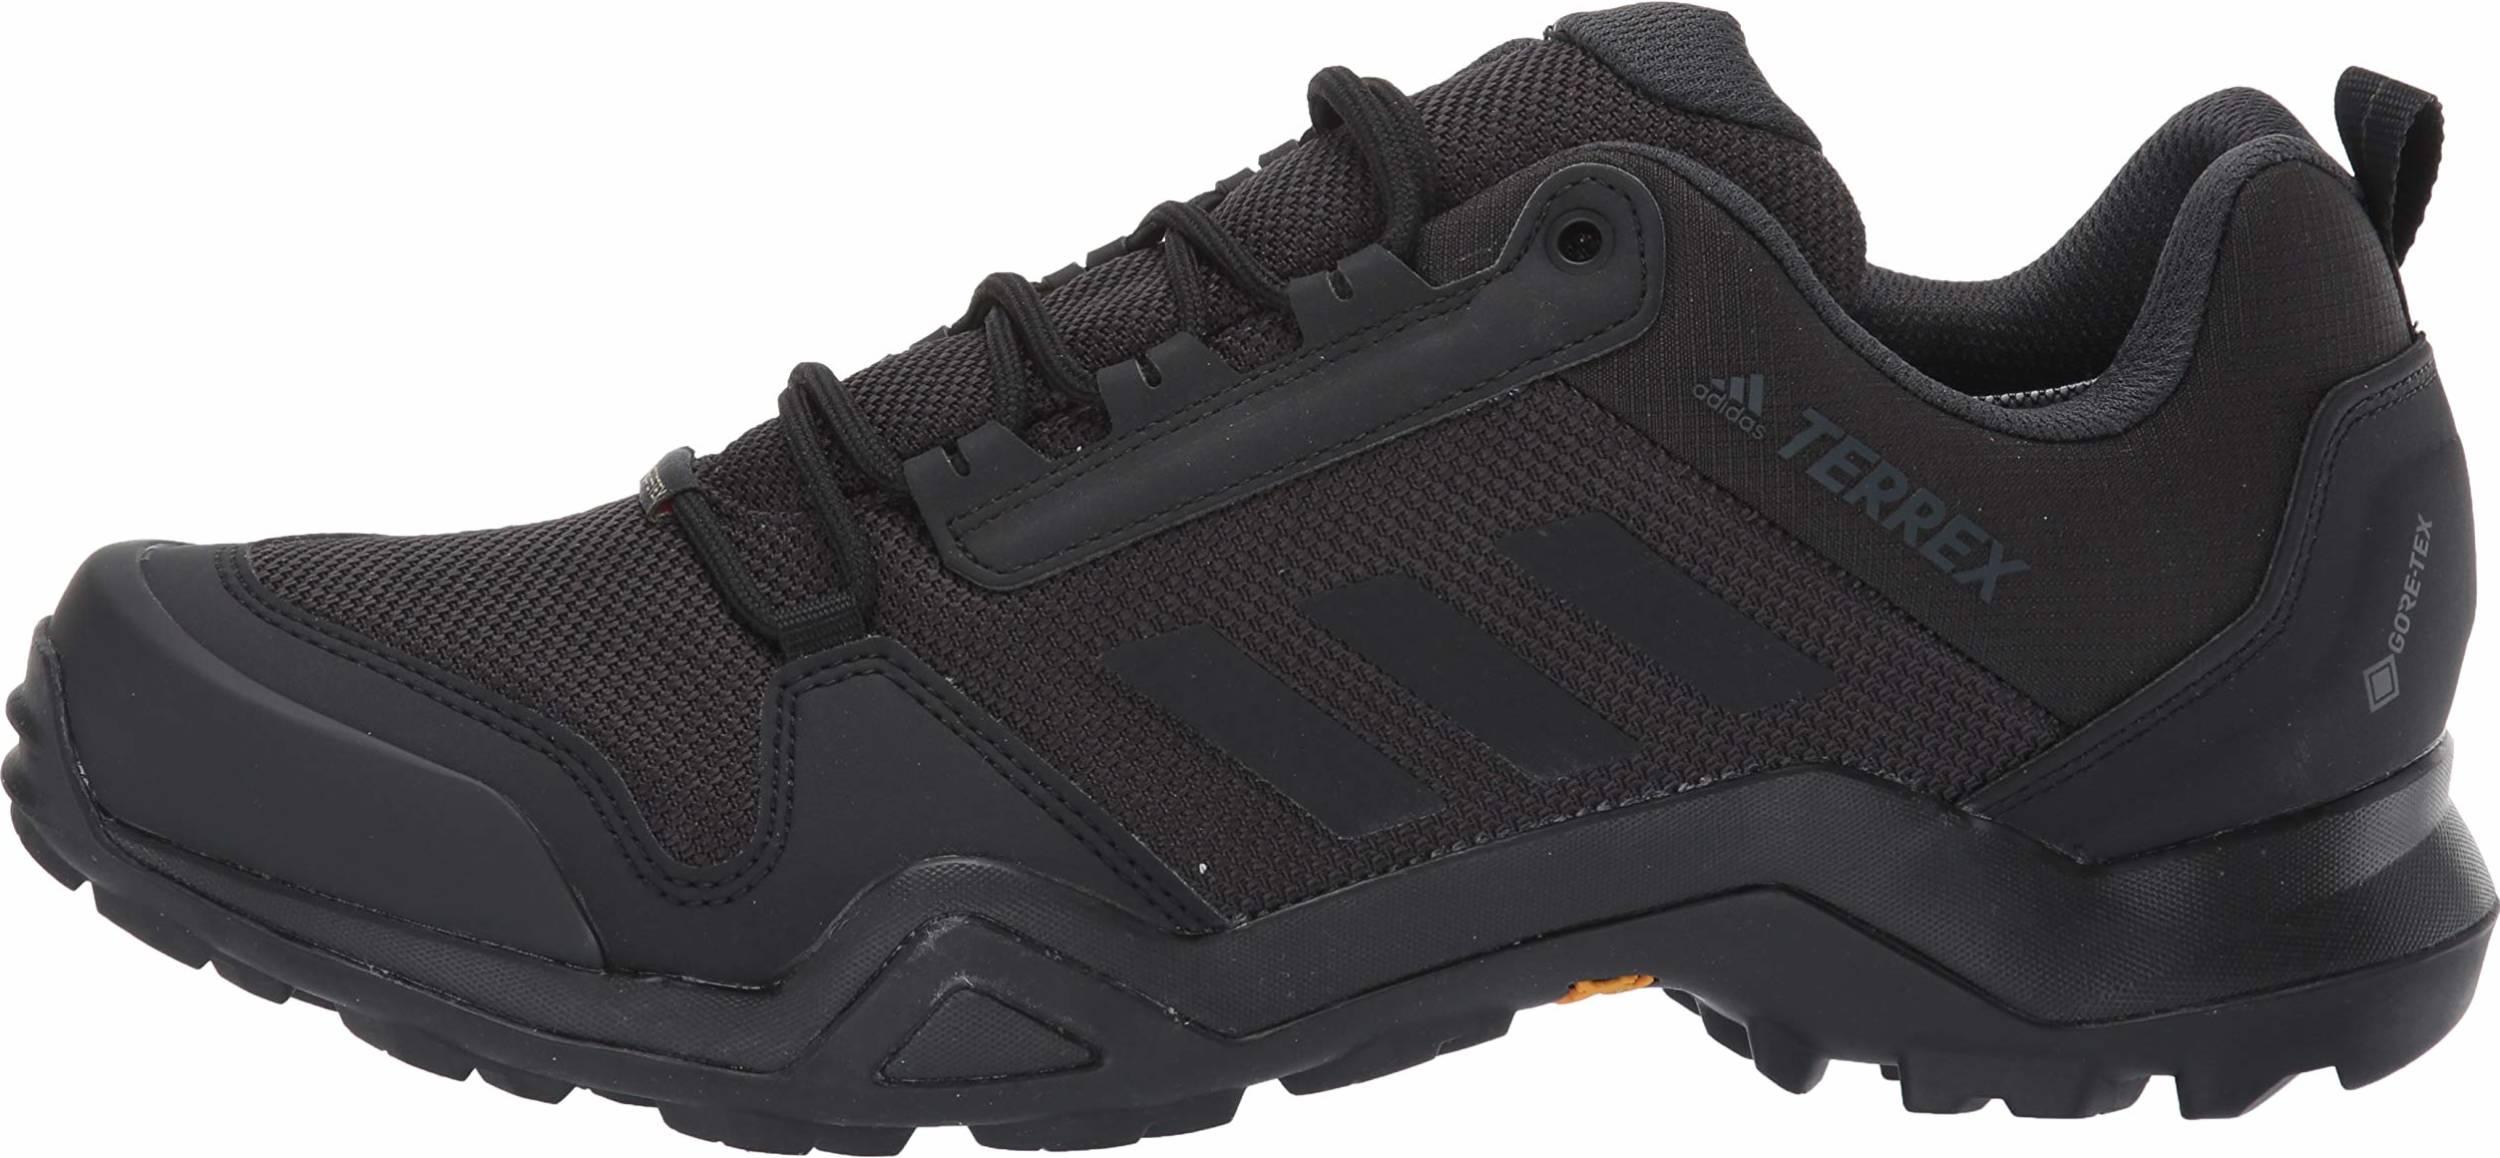 Adidas Terrex AX3 GTX